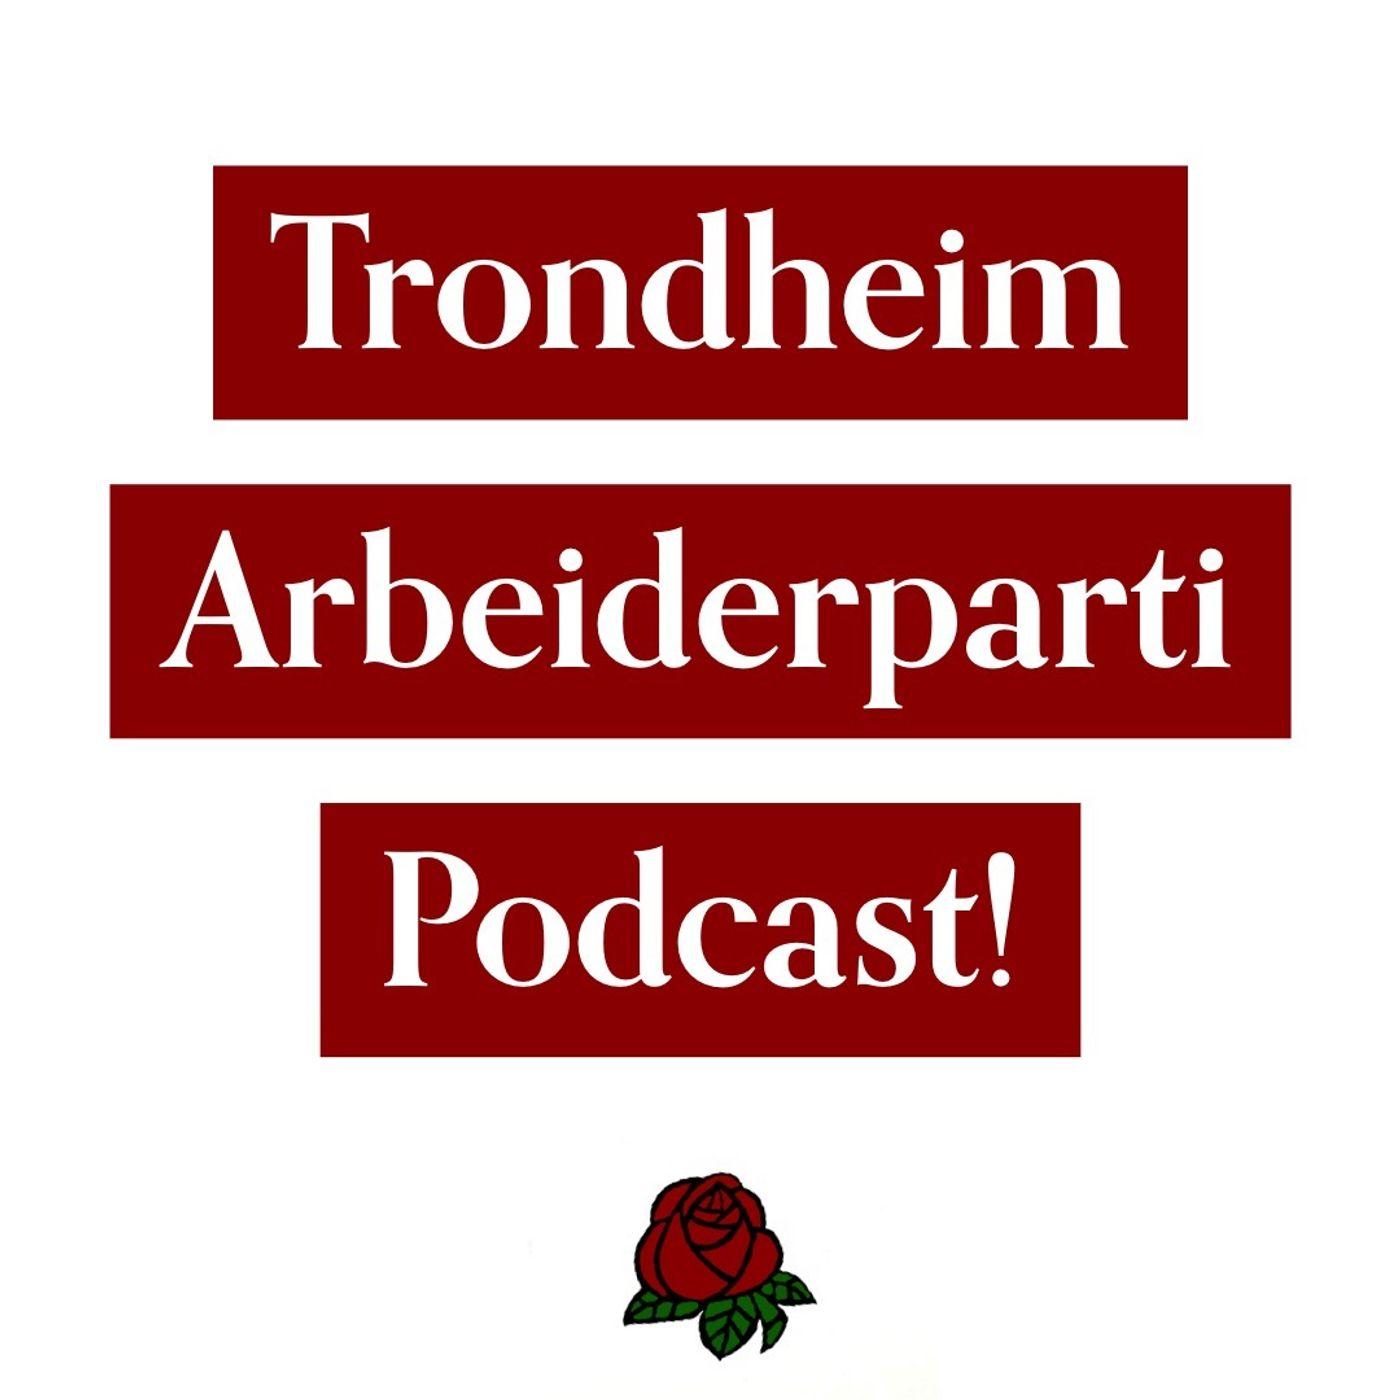 Trondheim Arbeiderparti Podcast!